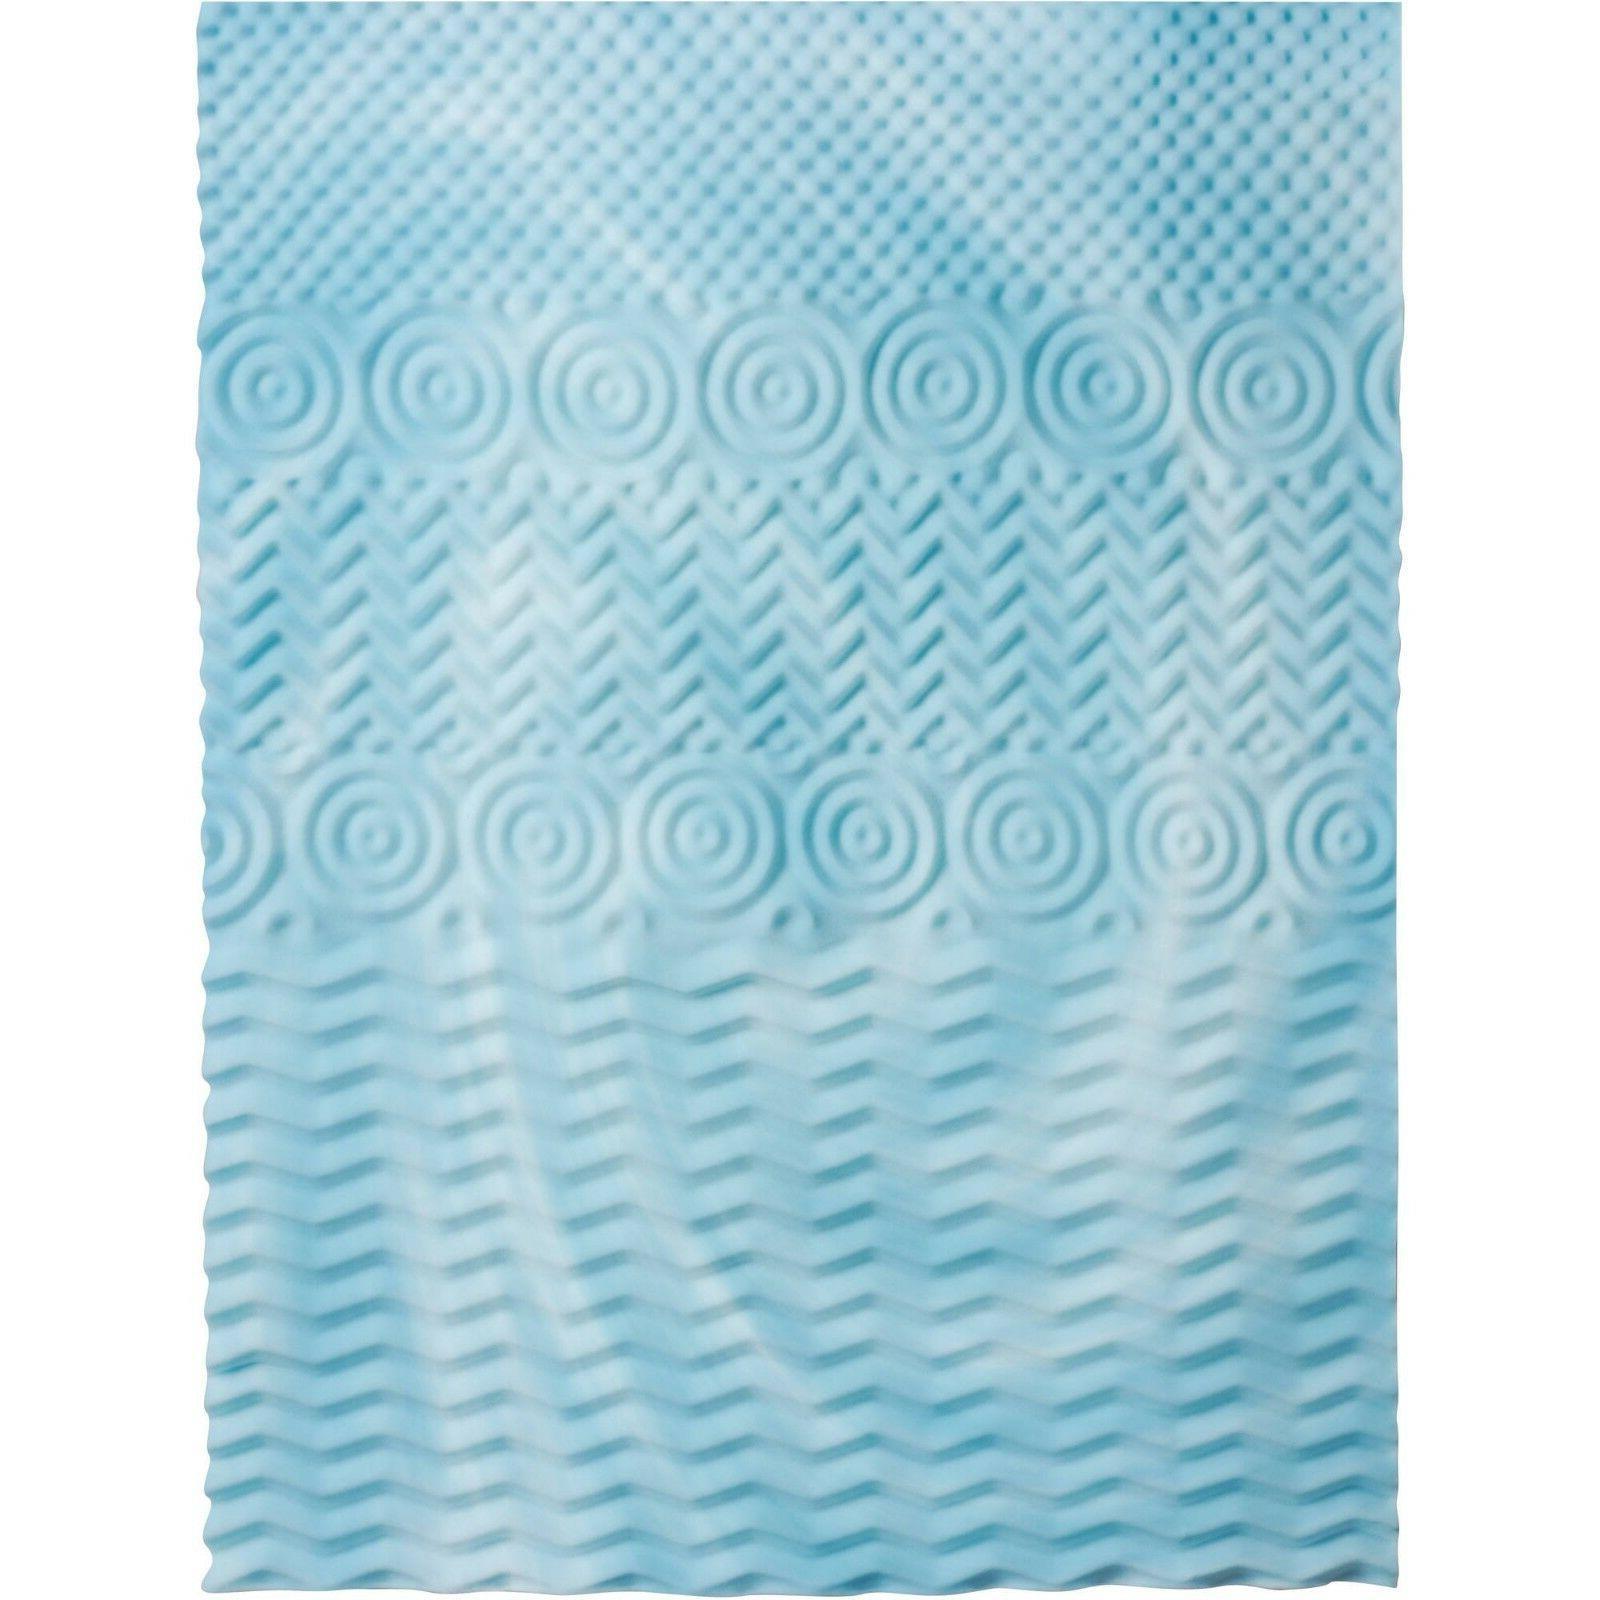 Authentic 2-Inch 5-Zone Foam Twin Mattress Topper